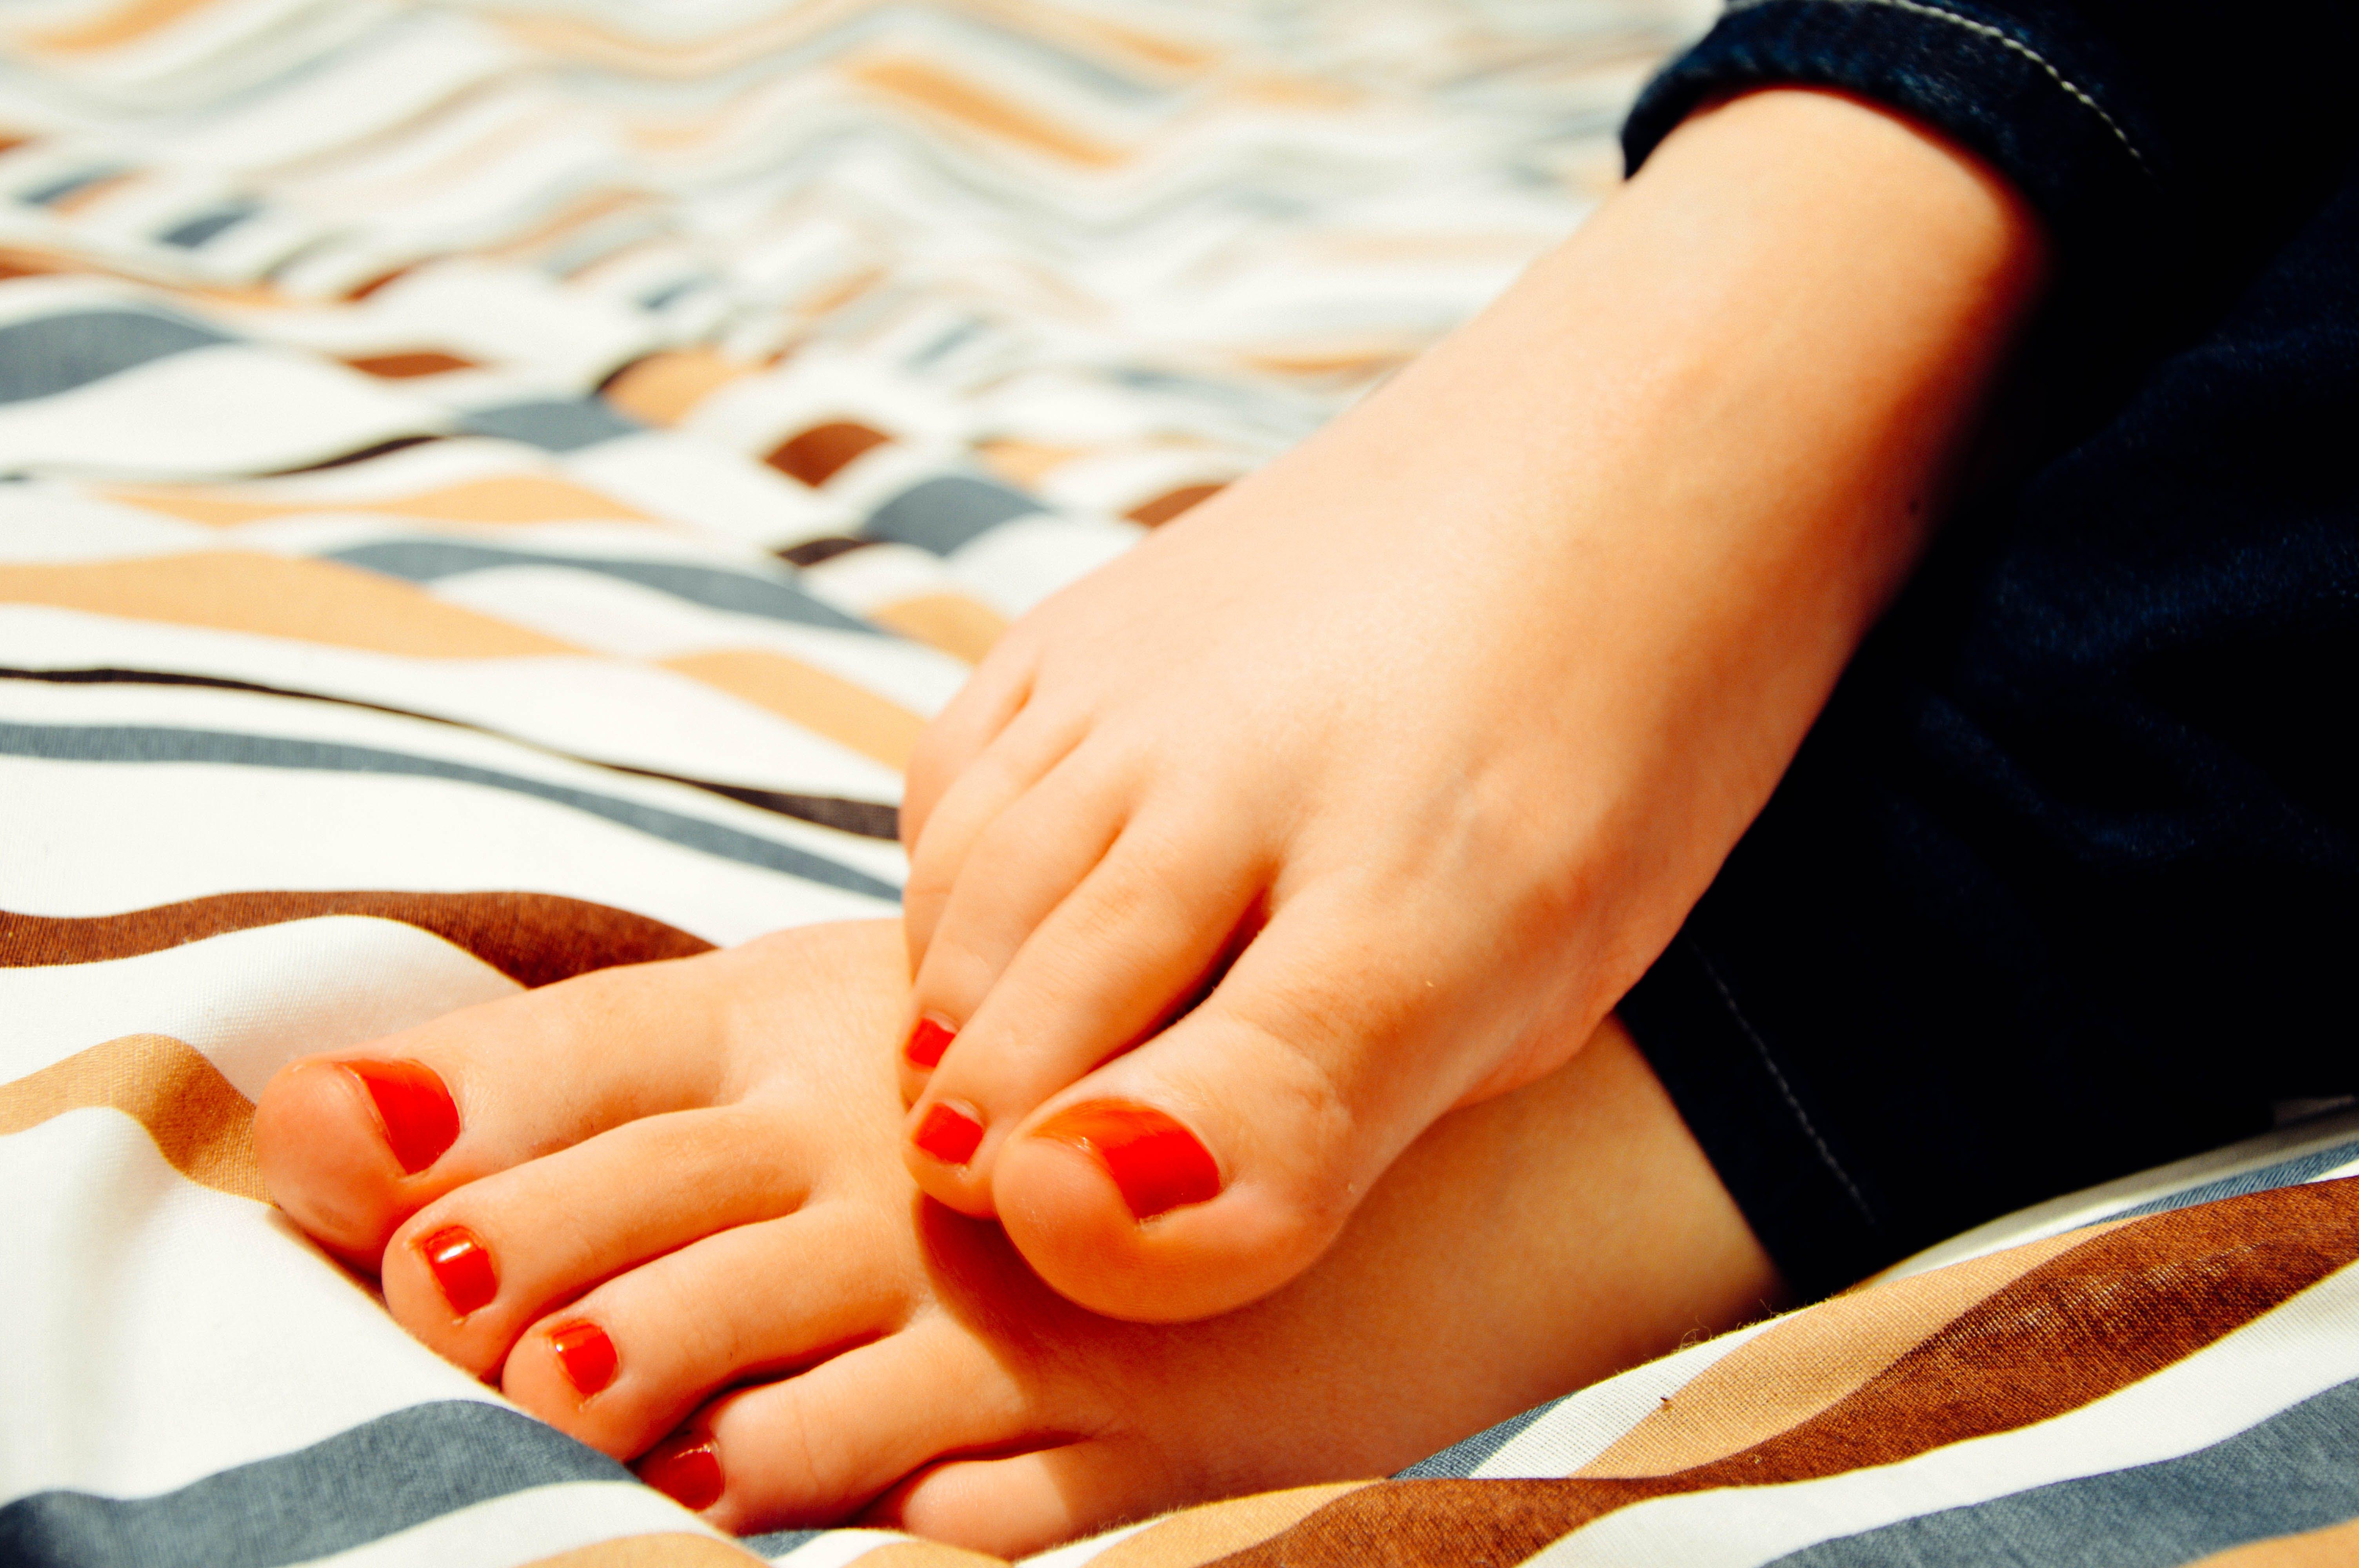 Free stock photo of barefoot, close-up, feet, nail polish